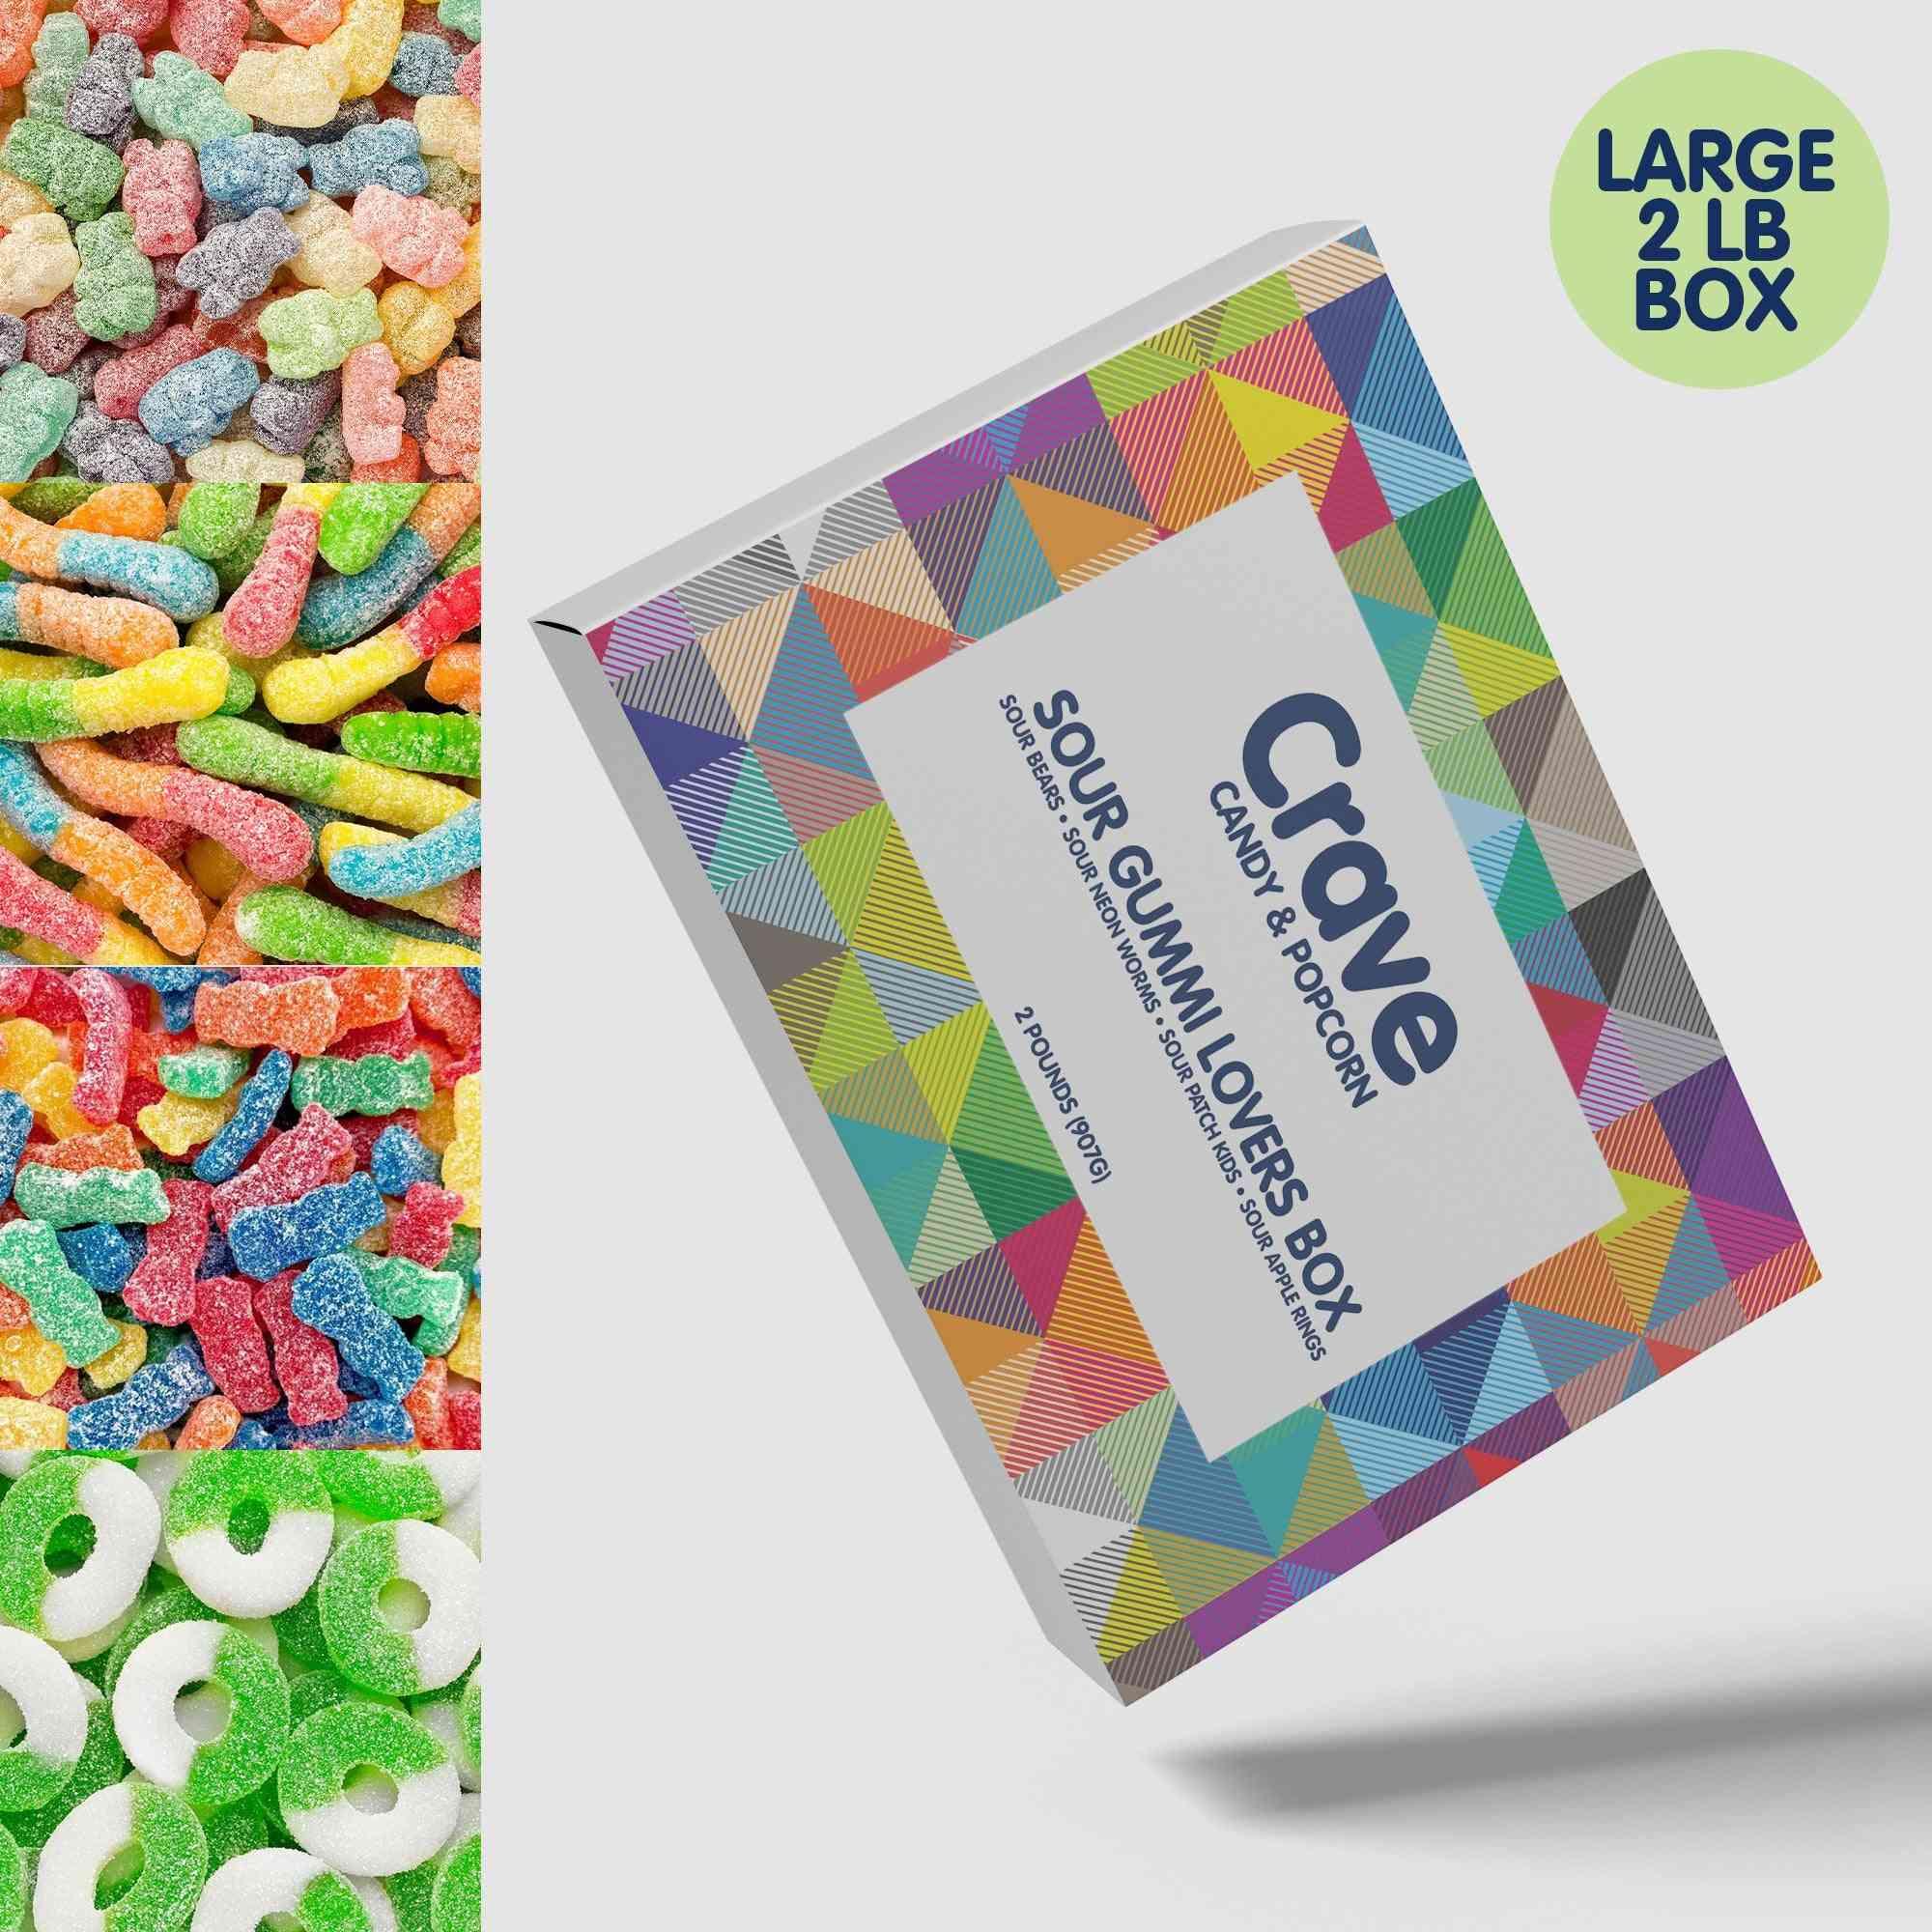 Sour Gummi Lovers Box